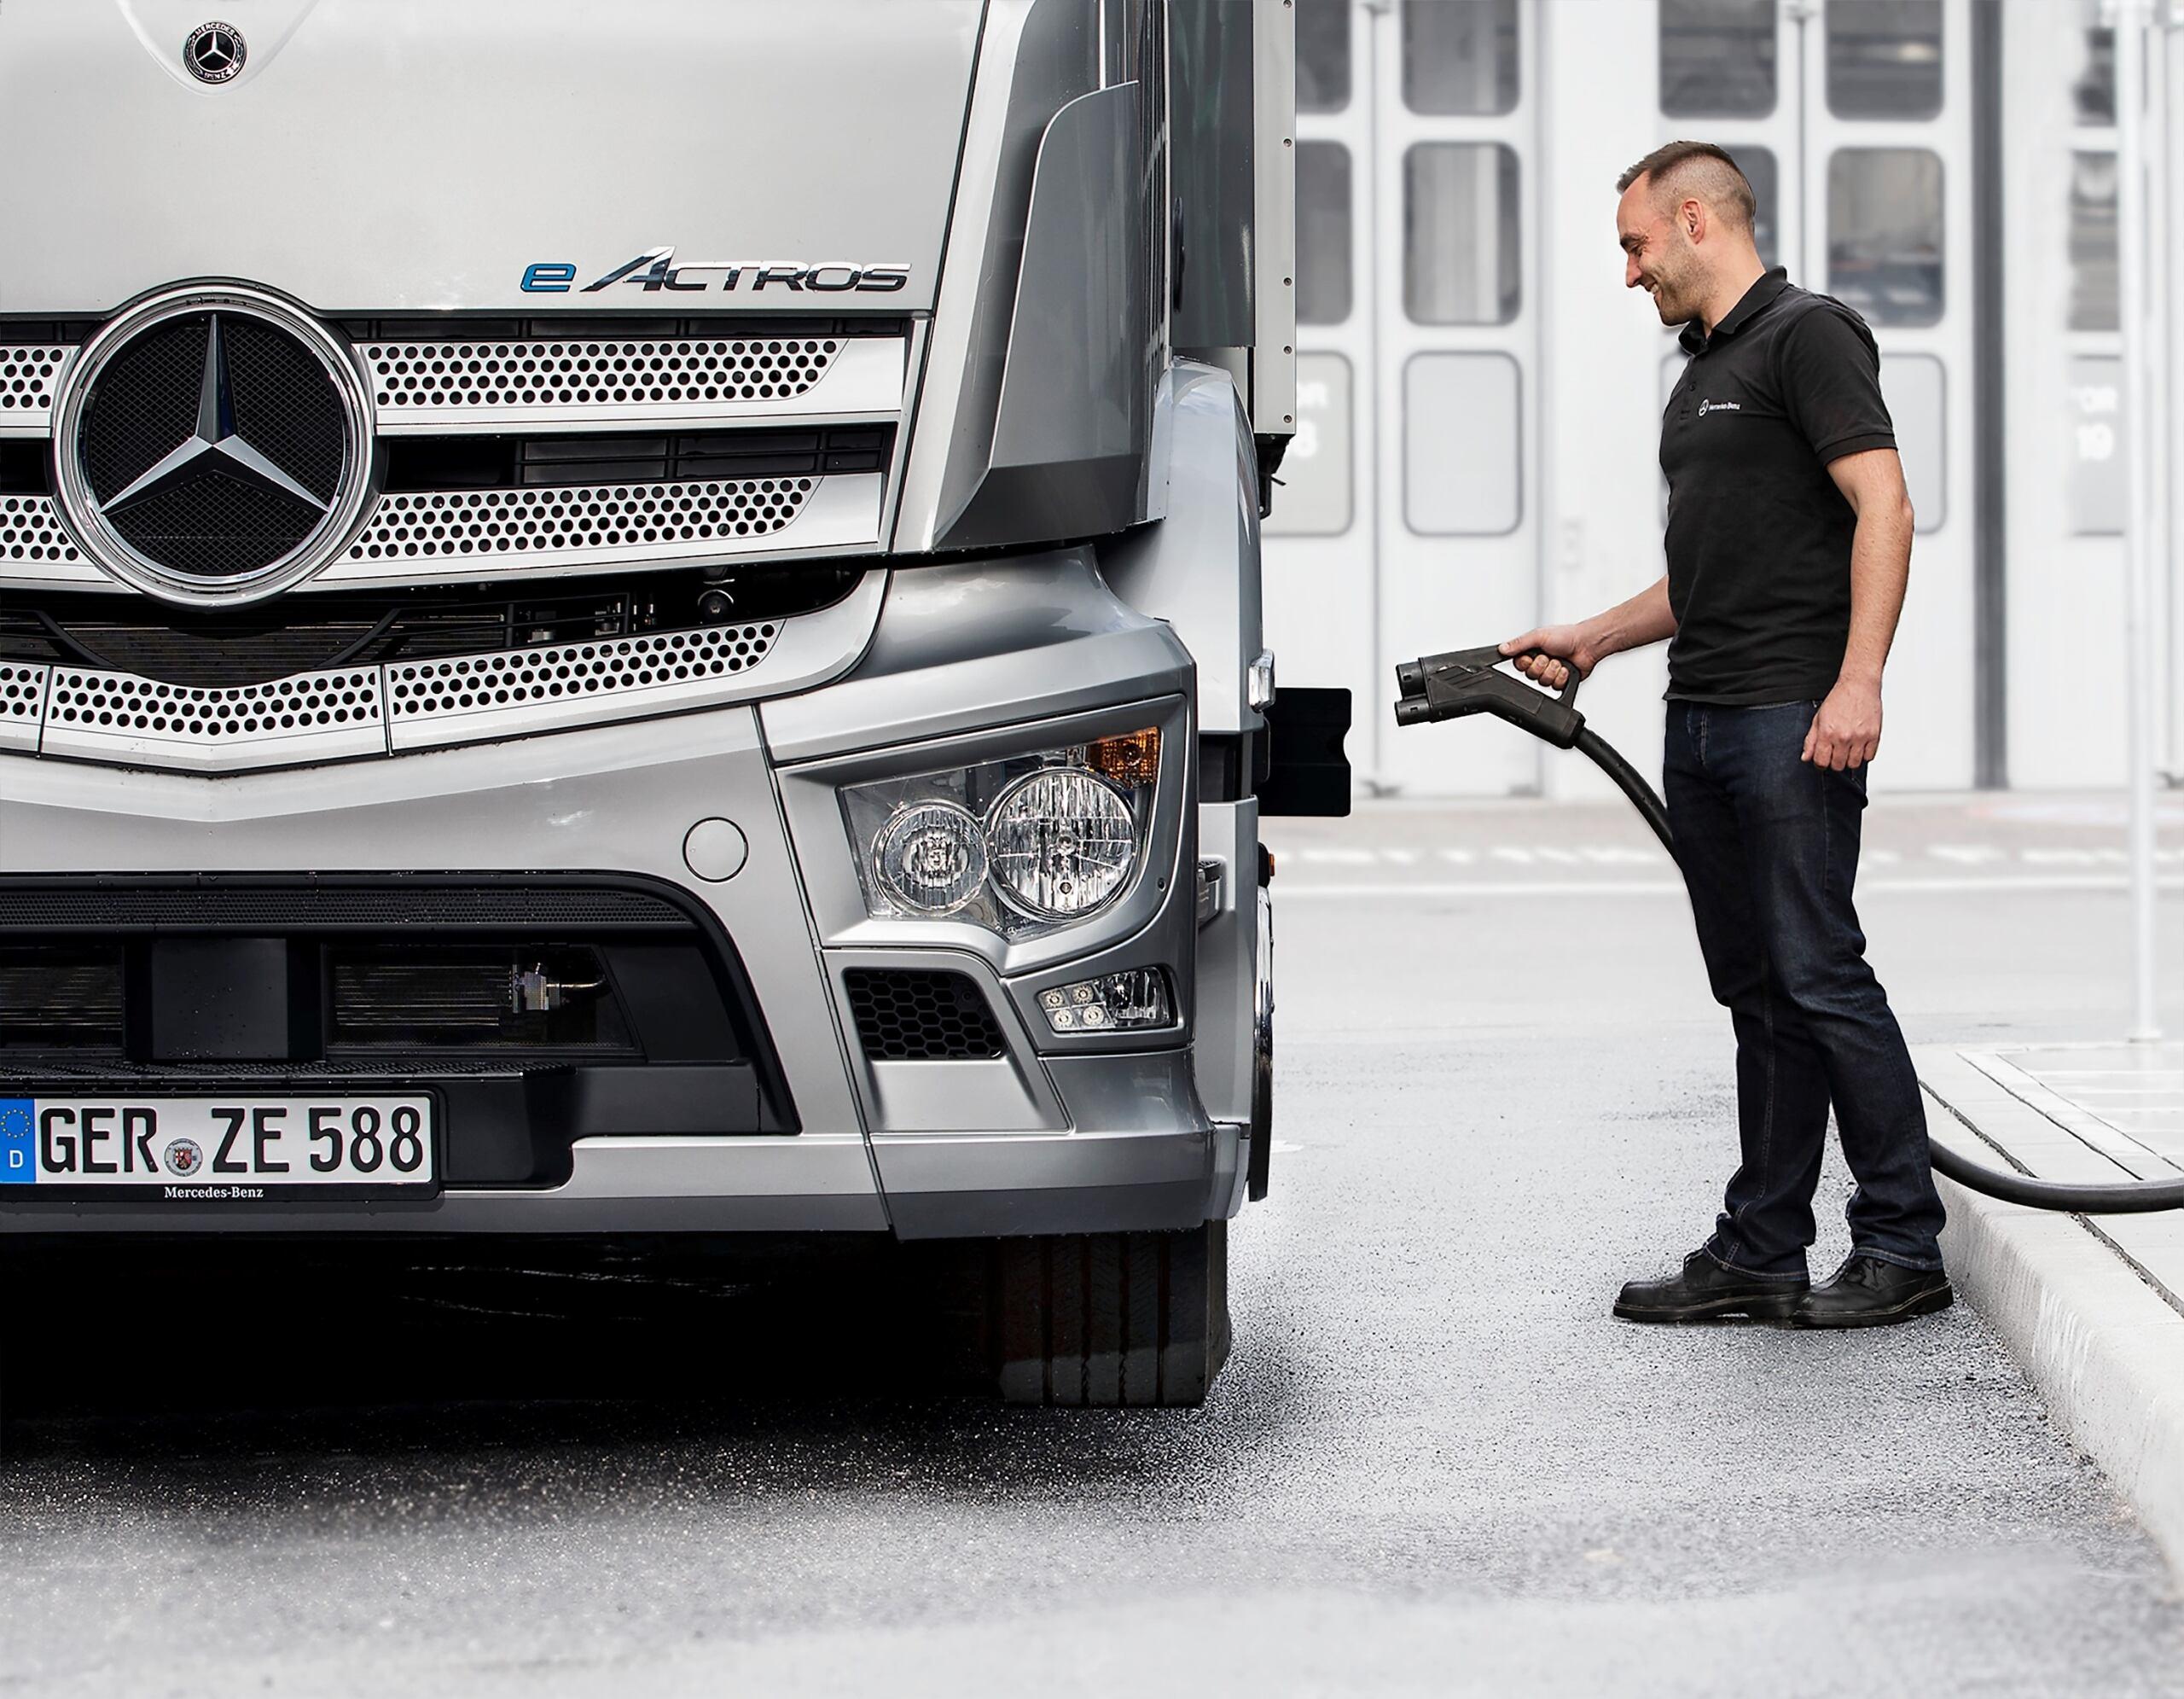 Mercedes-Benz Trucks infrastrutture ricarica